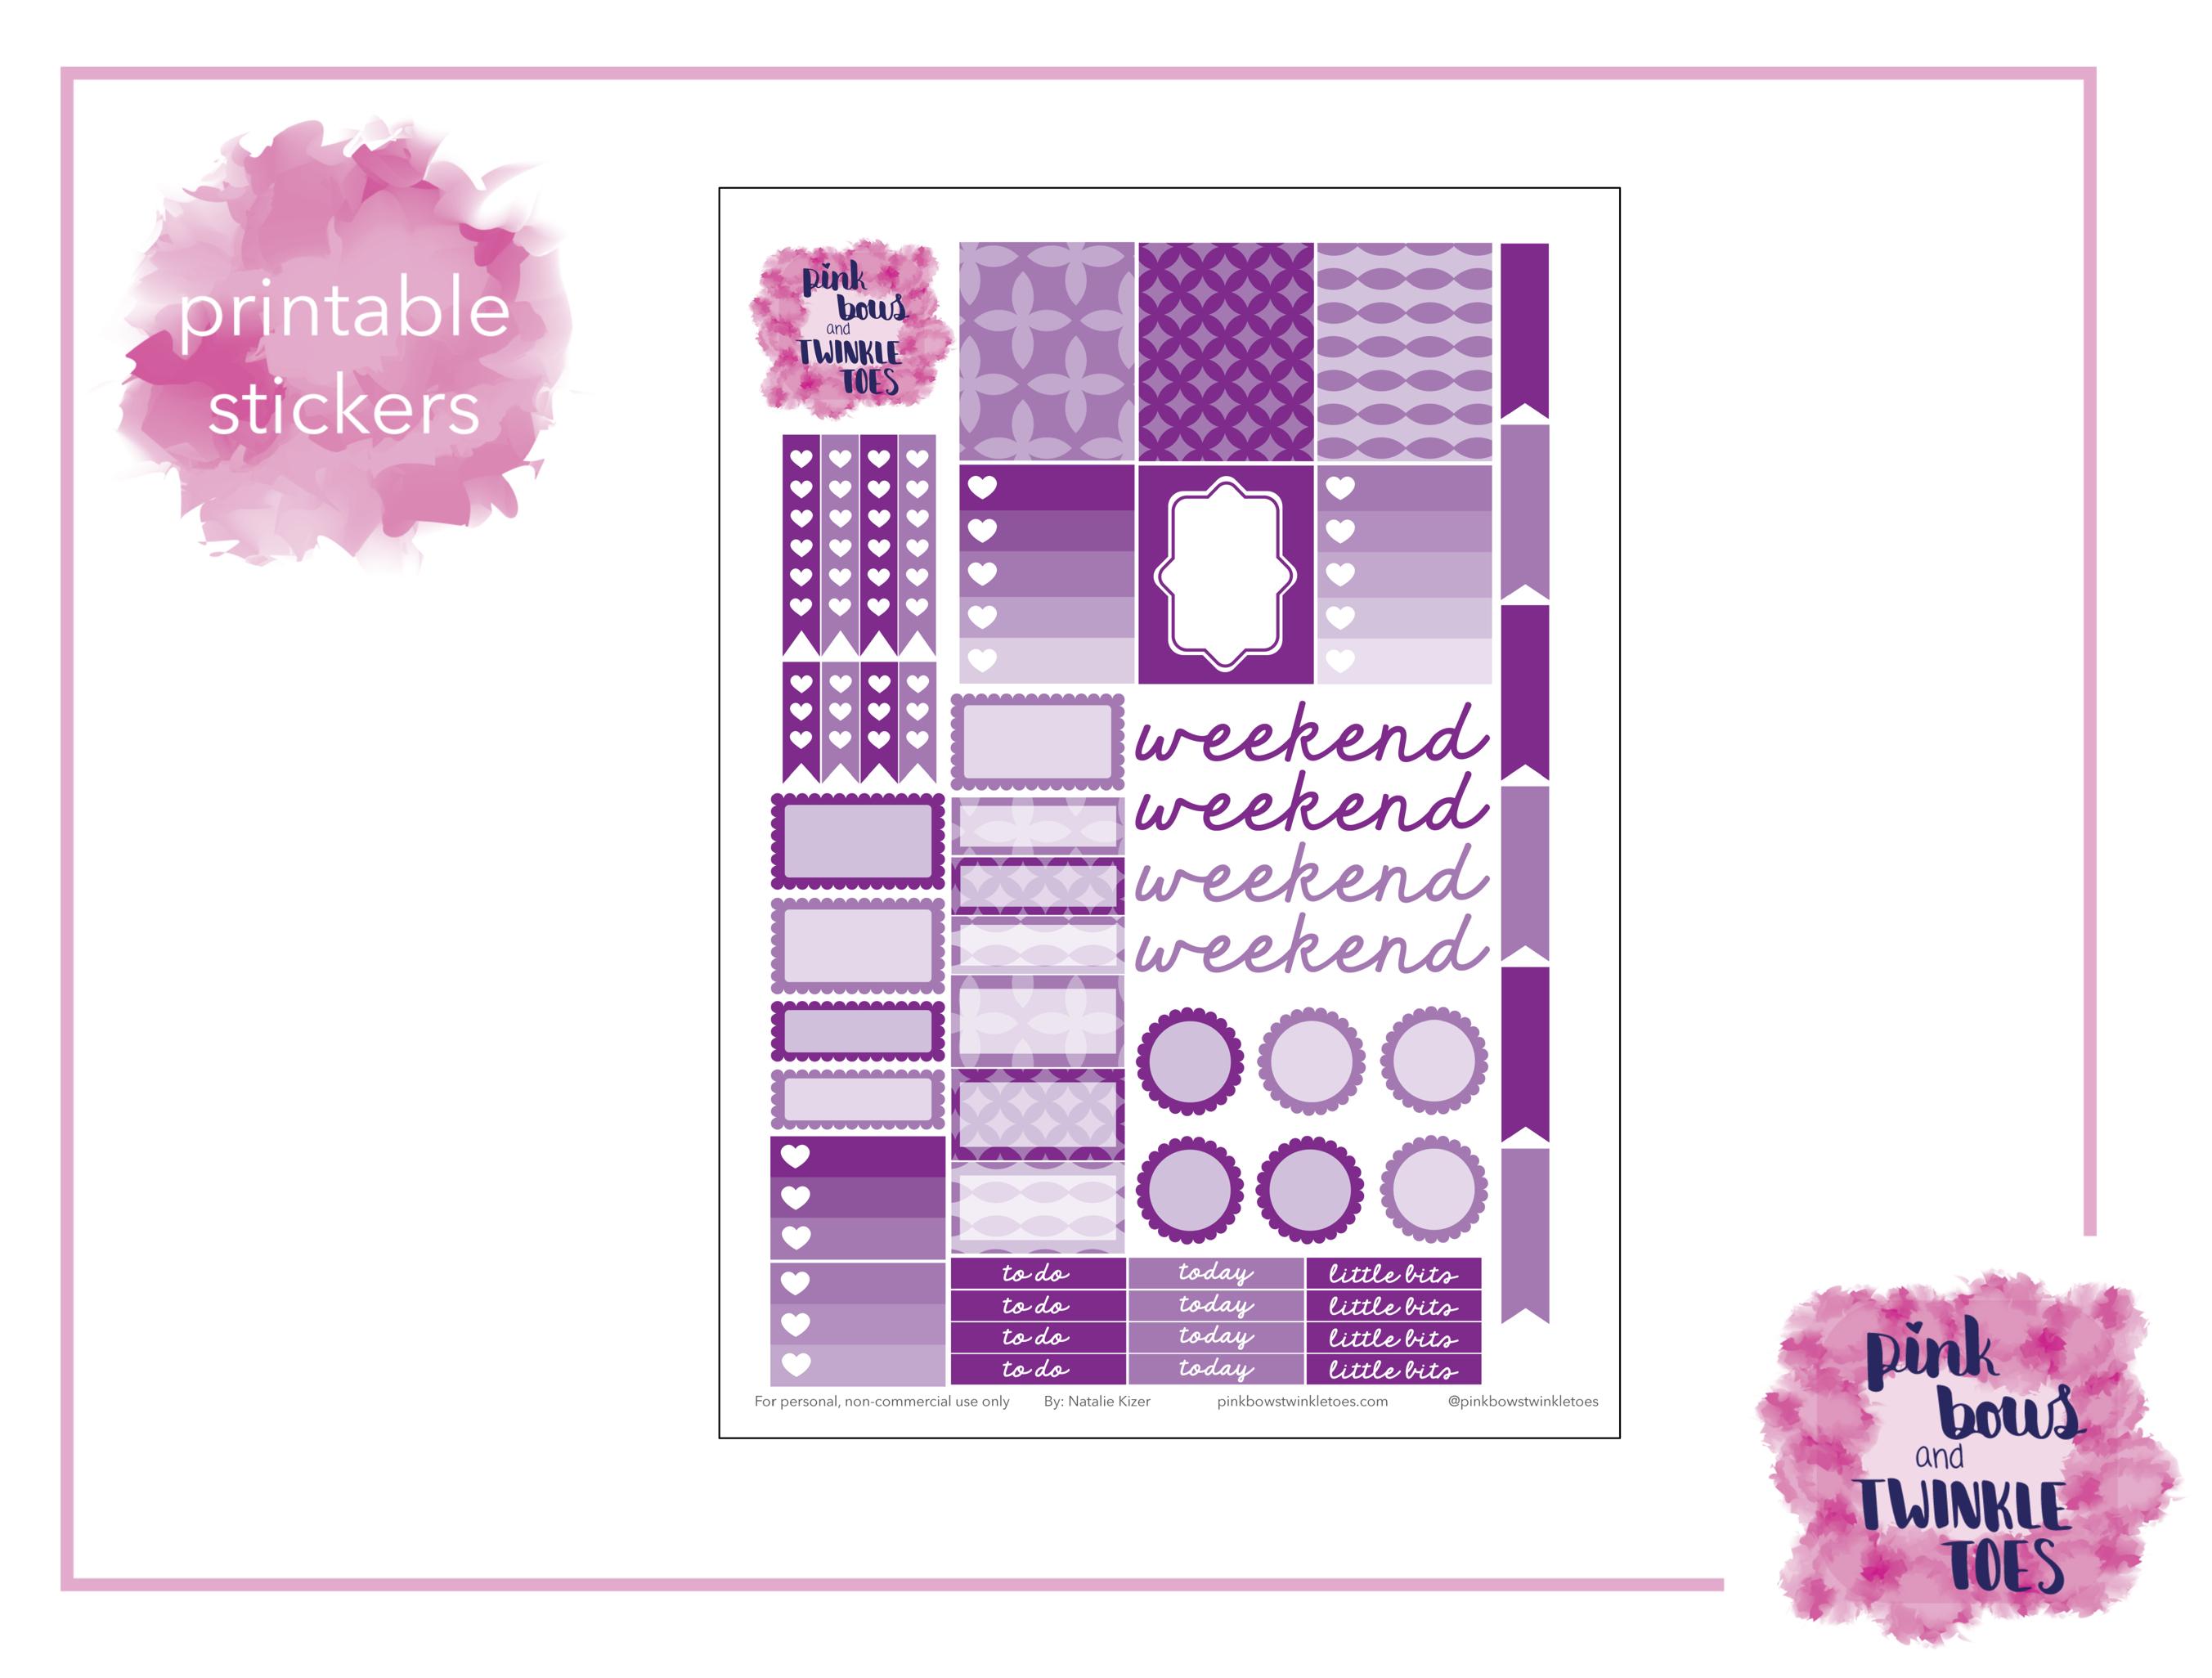 photo regarding Free Printable Functional Planner Stickers titled September Sensible Planner Stickers: Cost-free Printable - Crimson